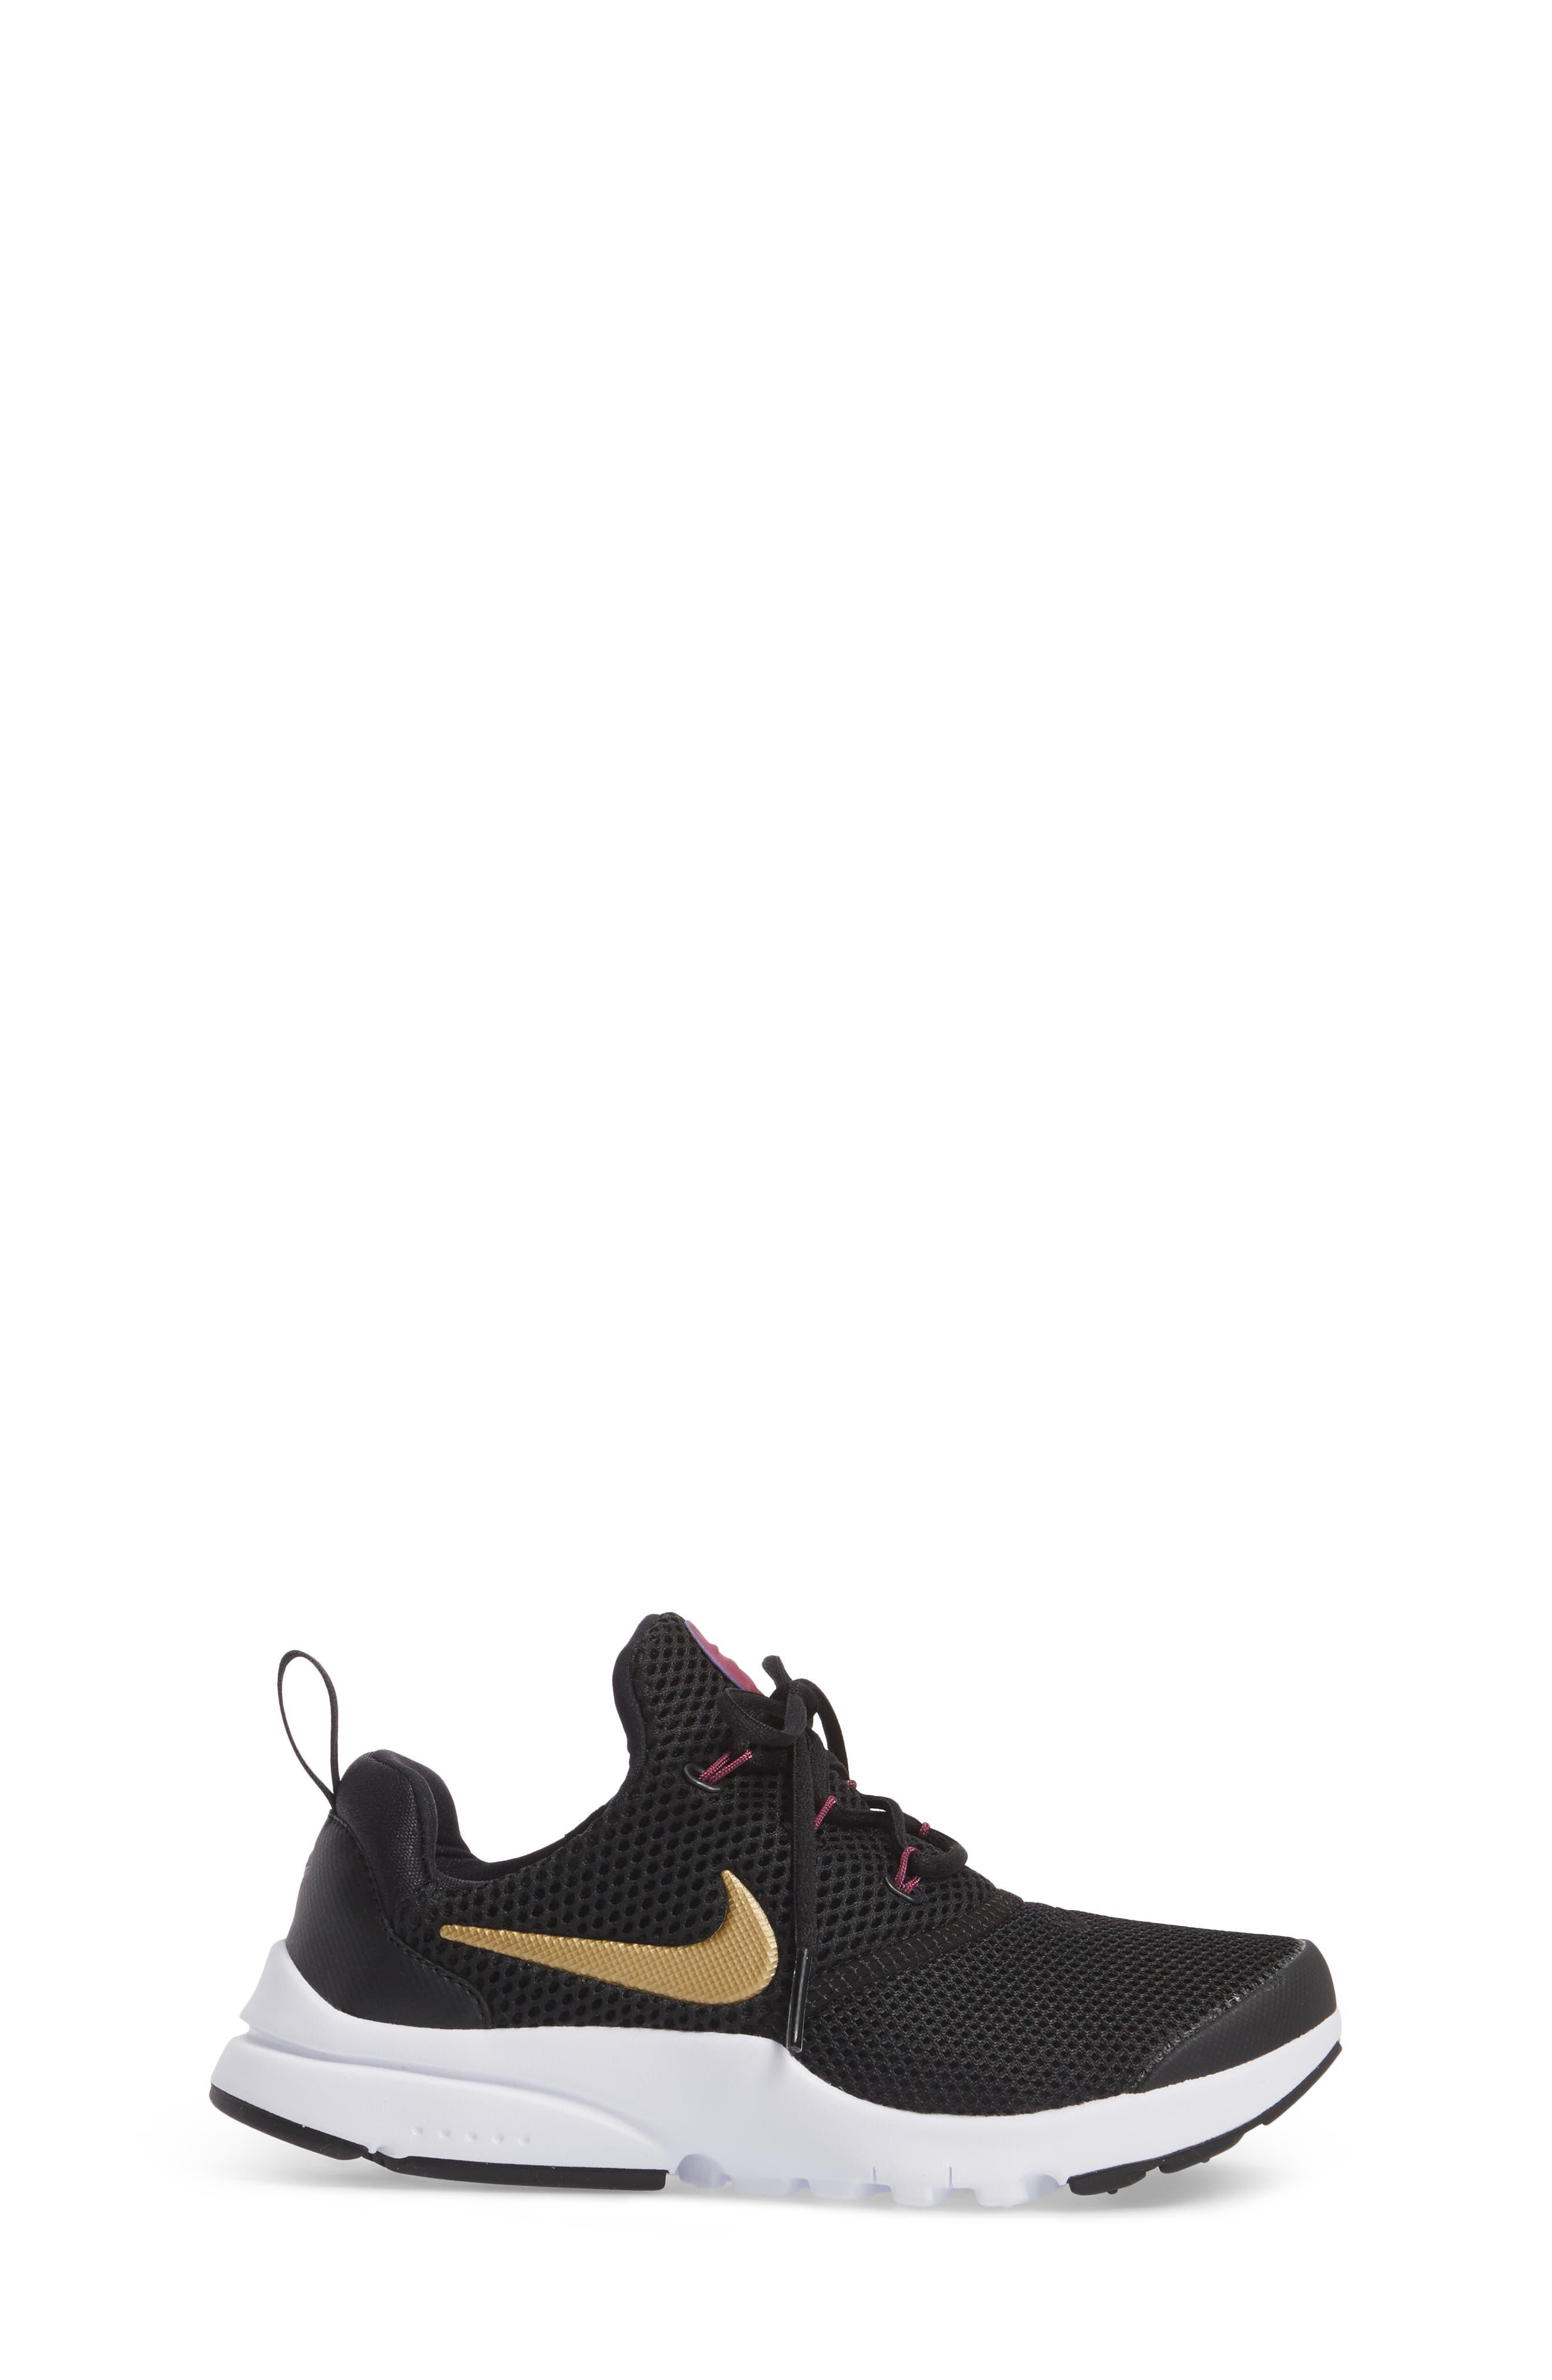 Presto Fly PS Sneaker,                             Alternate thumbnail 3, color,                             Black/ Gold